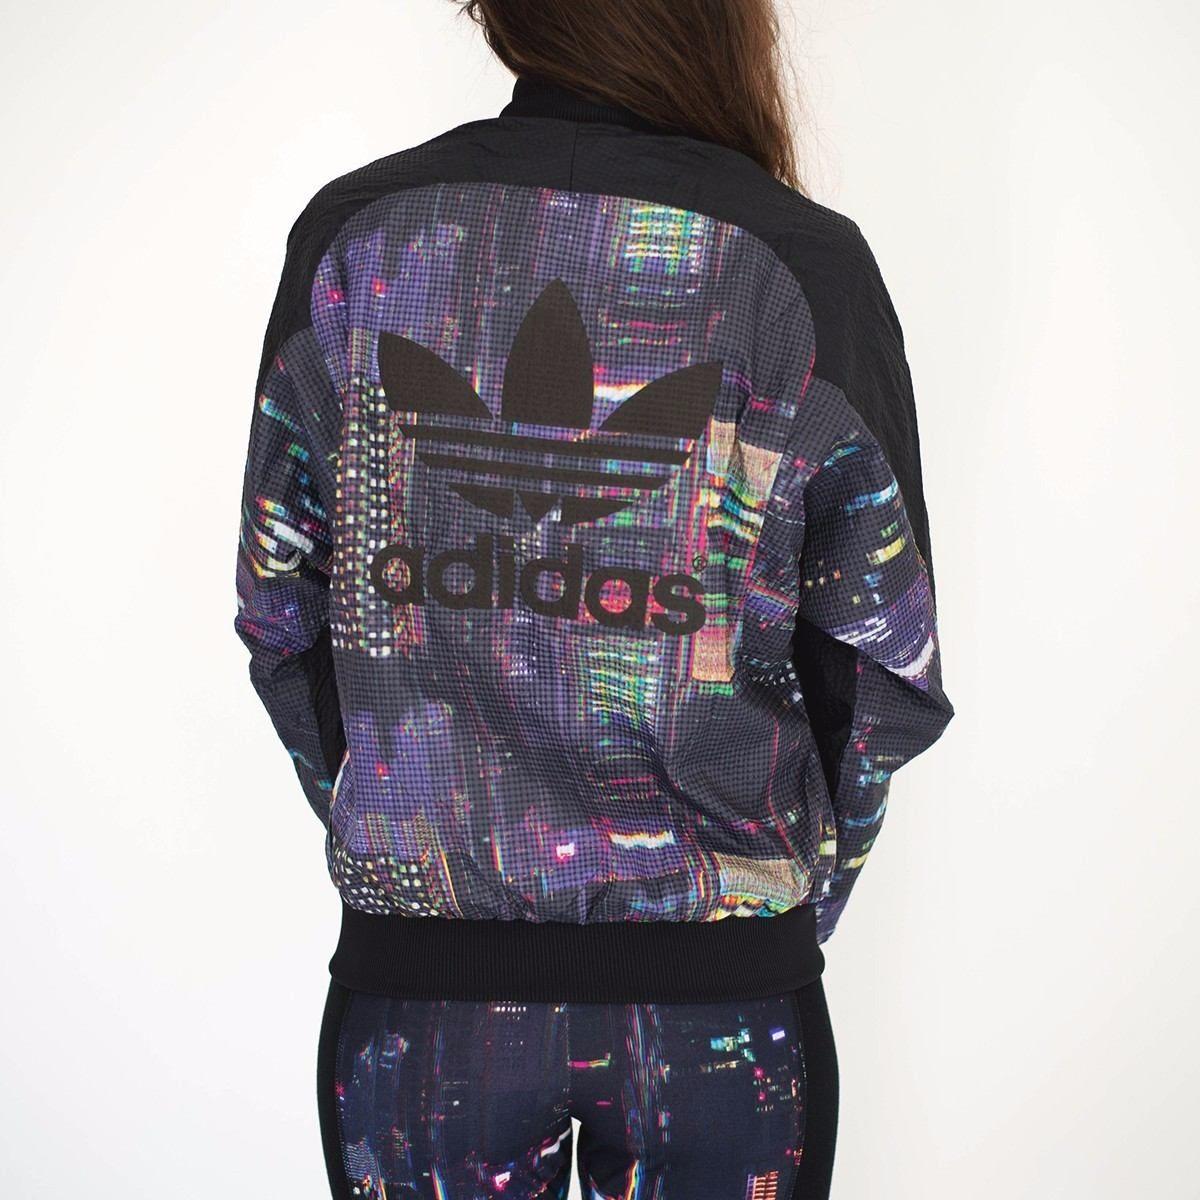 Campera Adidas Mujer Unico!! Original!! Talle S!! -   800 461922f758ad0